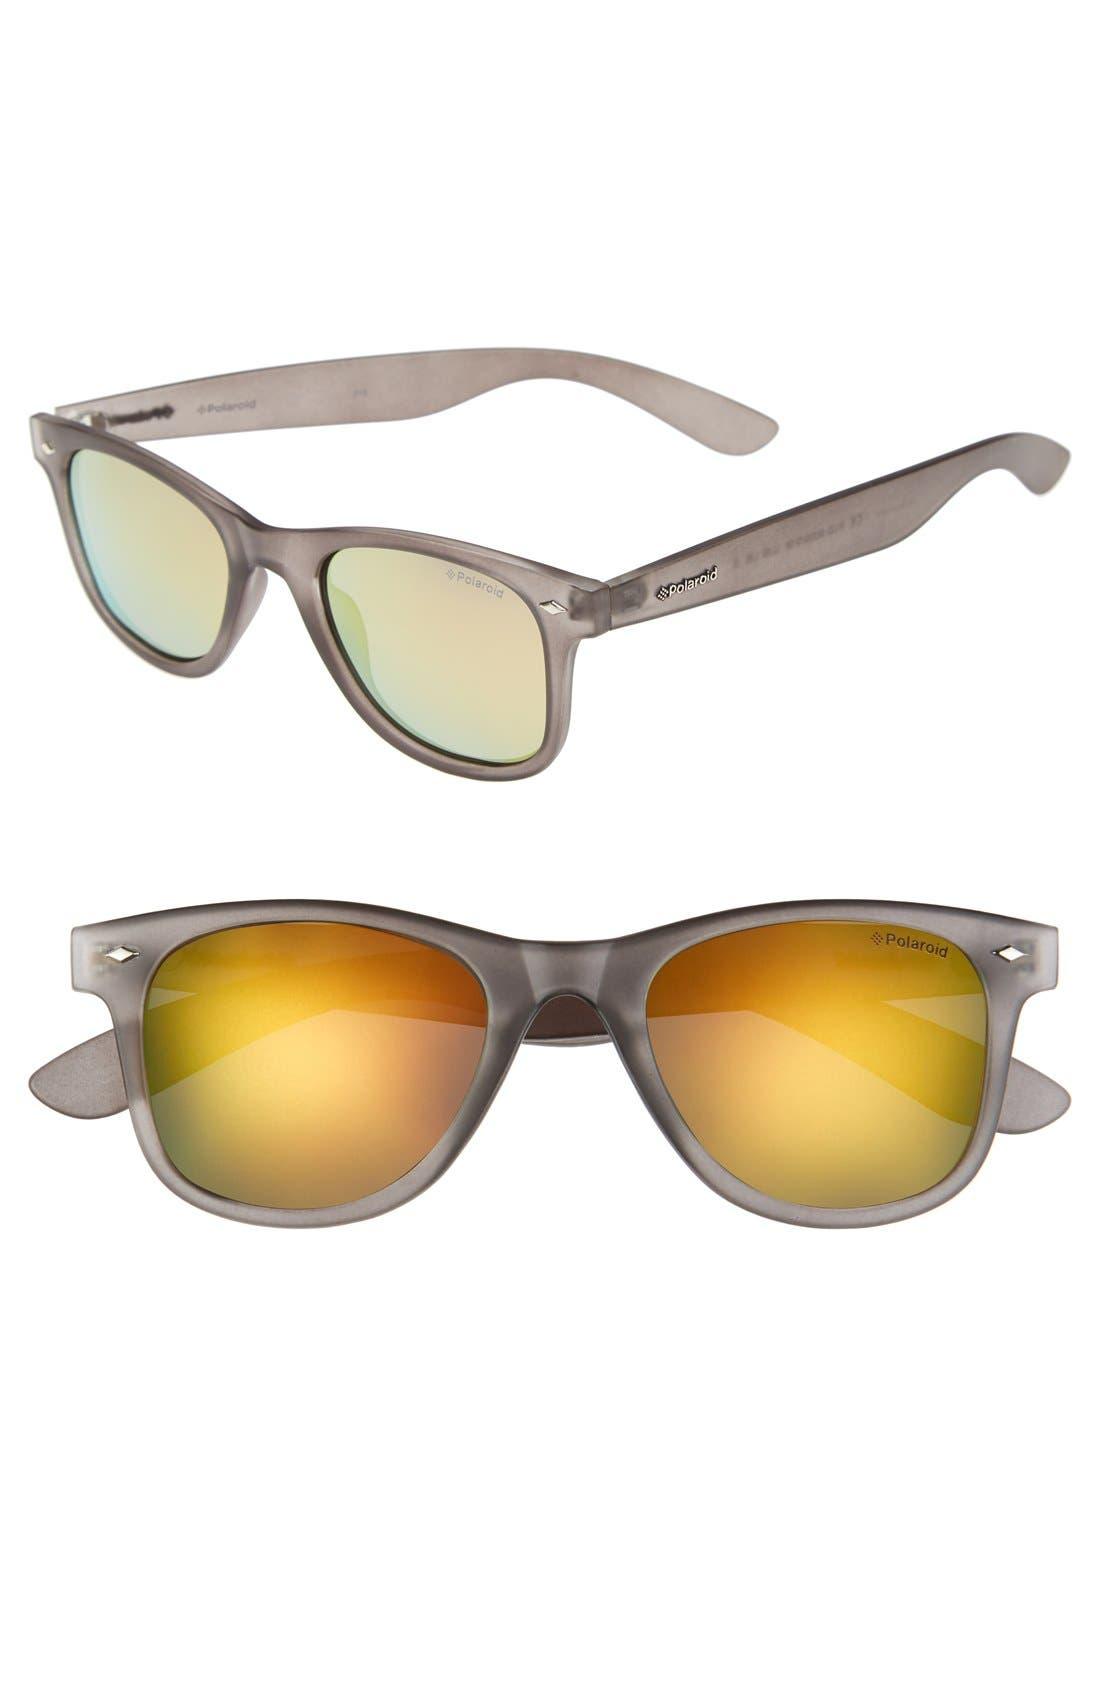 '6009SM' 50mm Polarized Retro Sunglasses, Main, color, 020